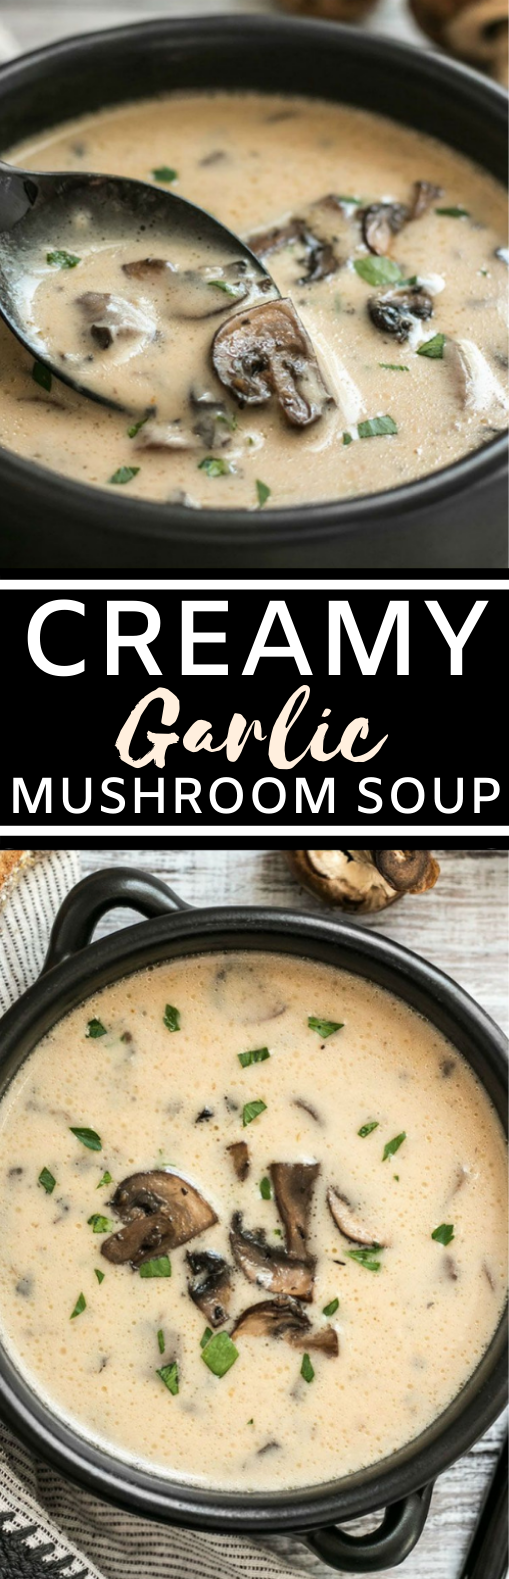 Creamy Garlic Mushroom Soup #vegetarian #soup #dinner #comfortfood #healthy